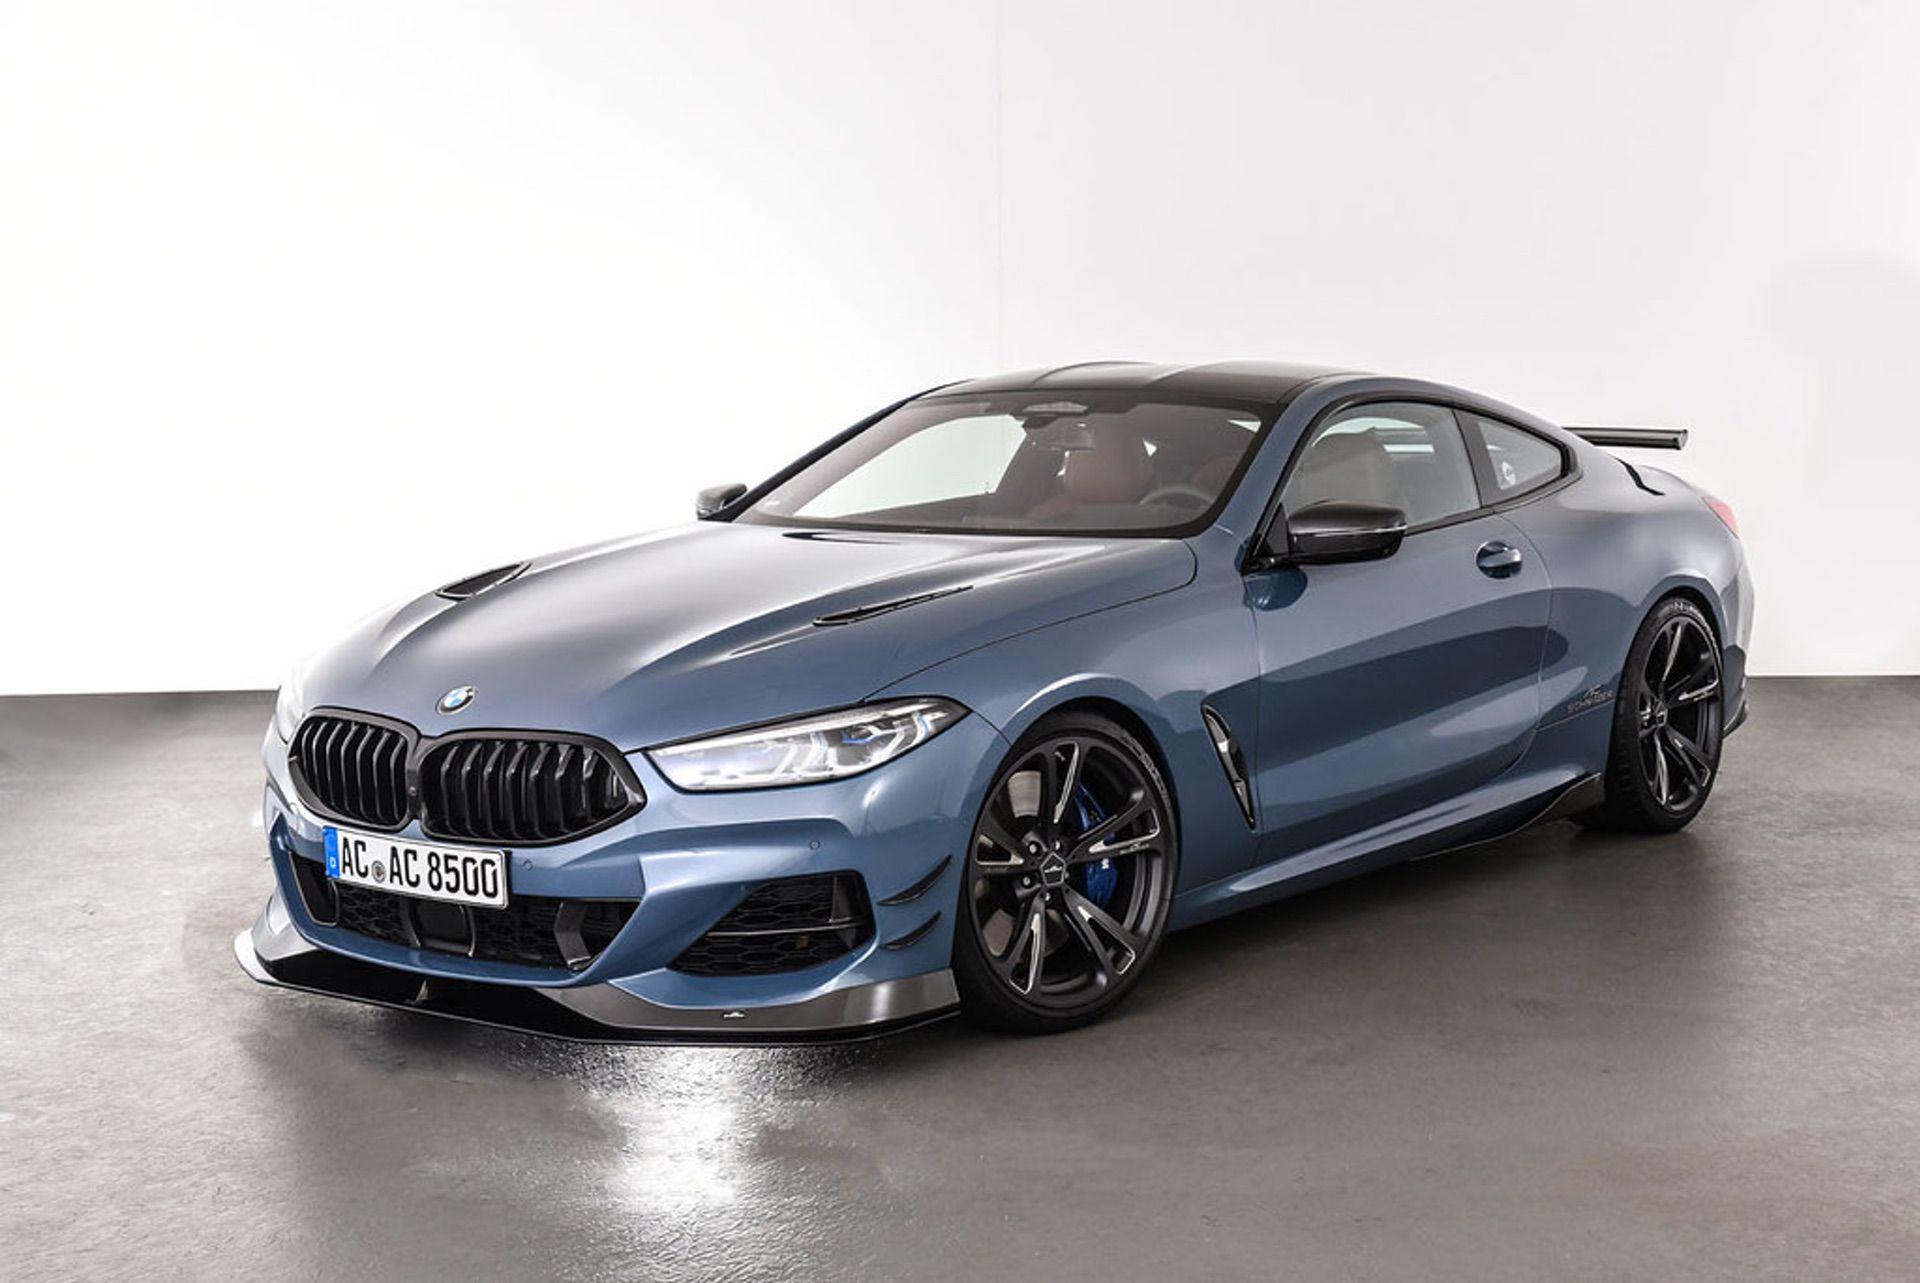 BMW 8 series by AC Schnitzer 01